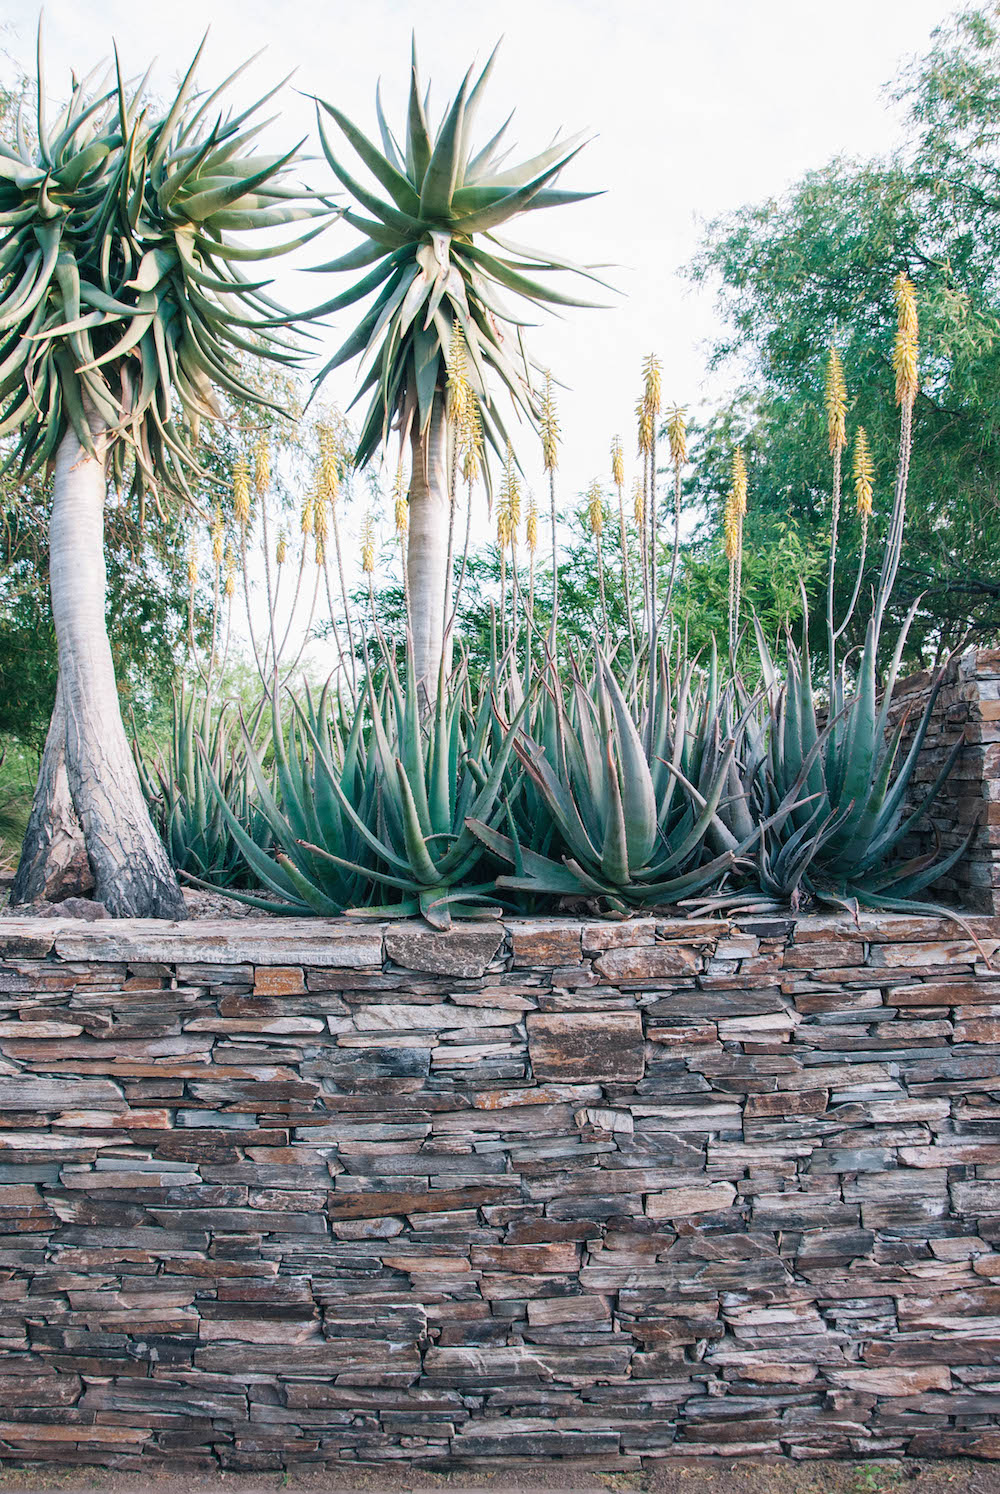 Tequila Tasting in Phoenix, Arizona - Agave on the Rocks